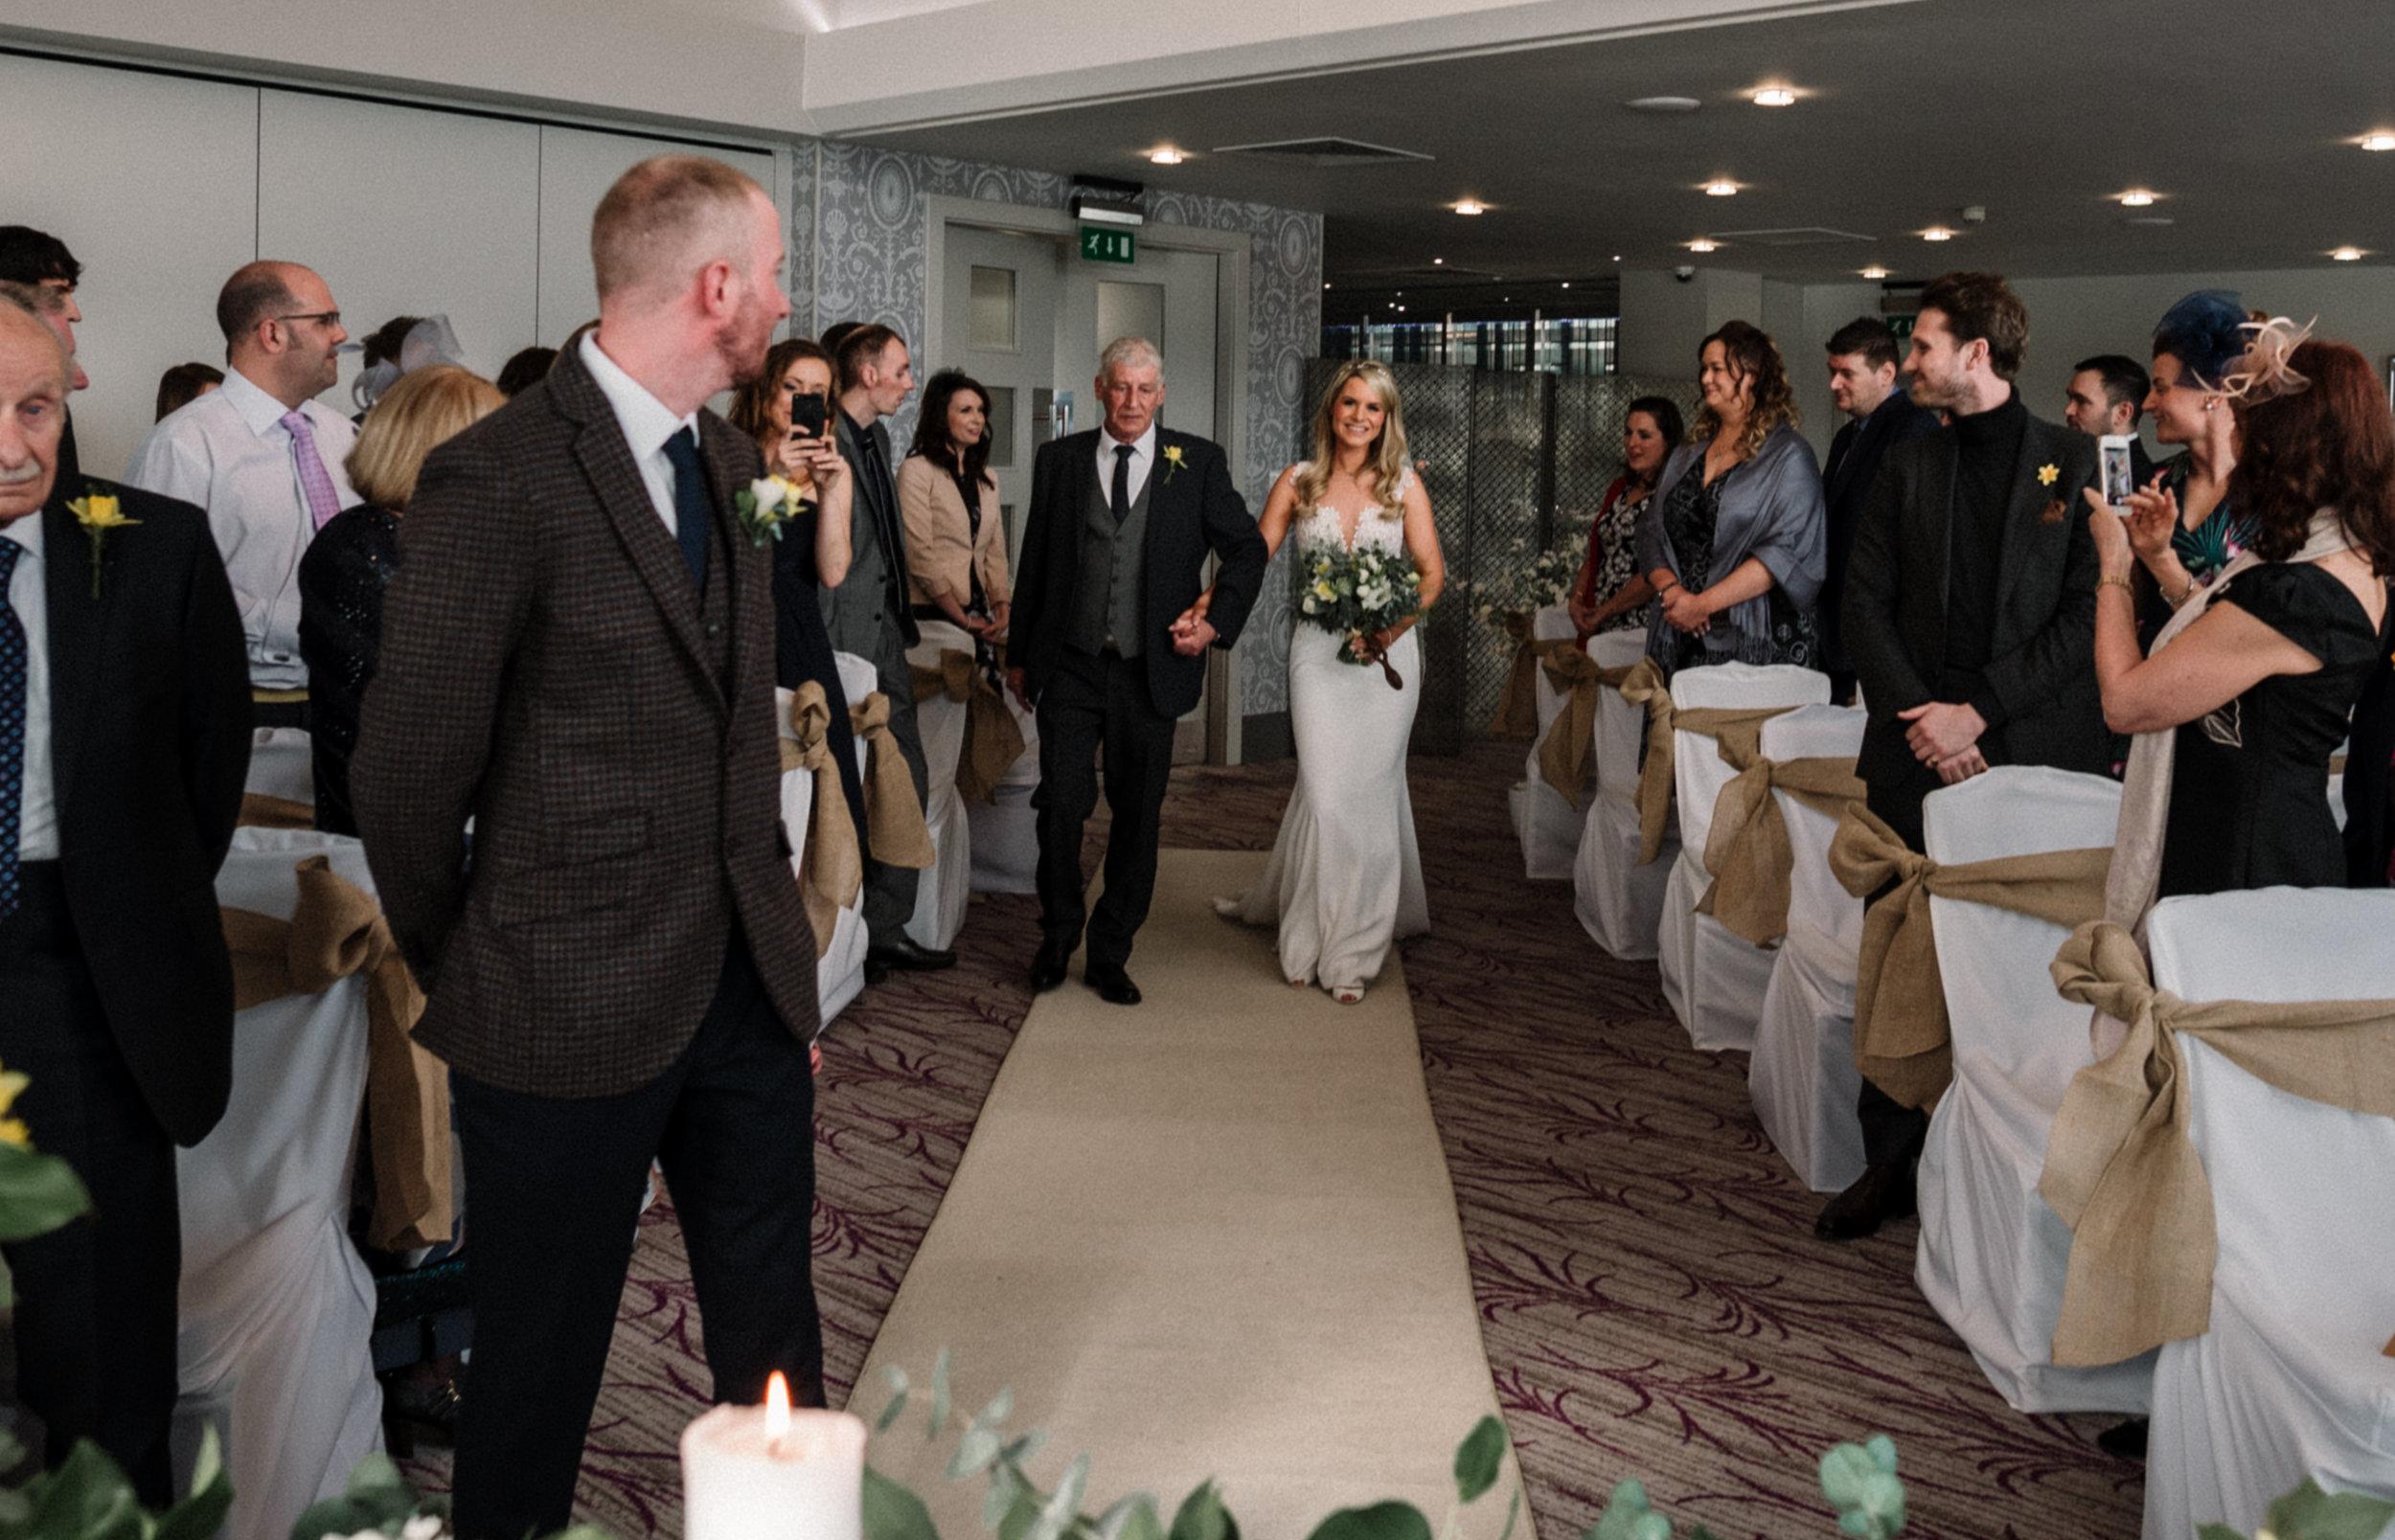 wales-wedding-photographer (21).jpg